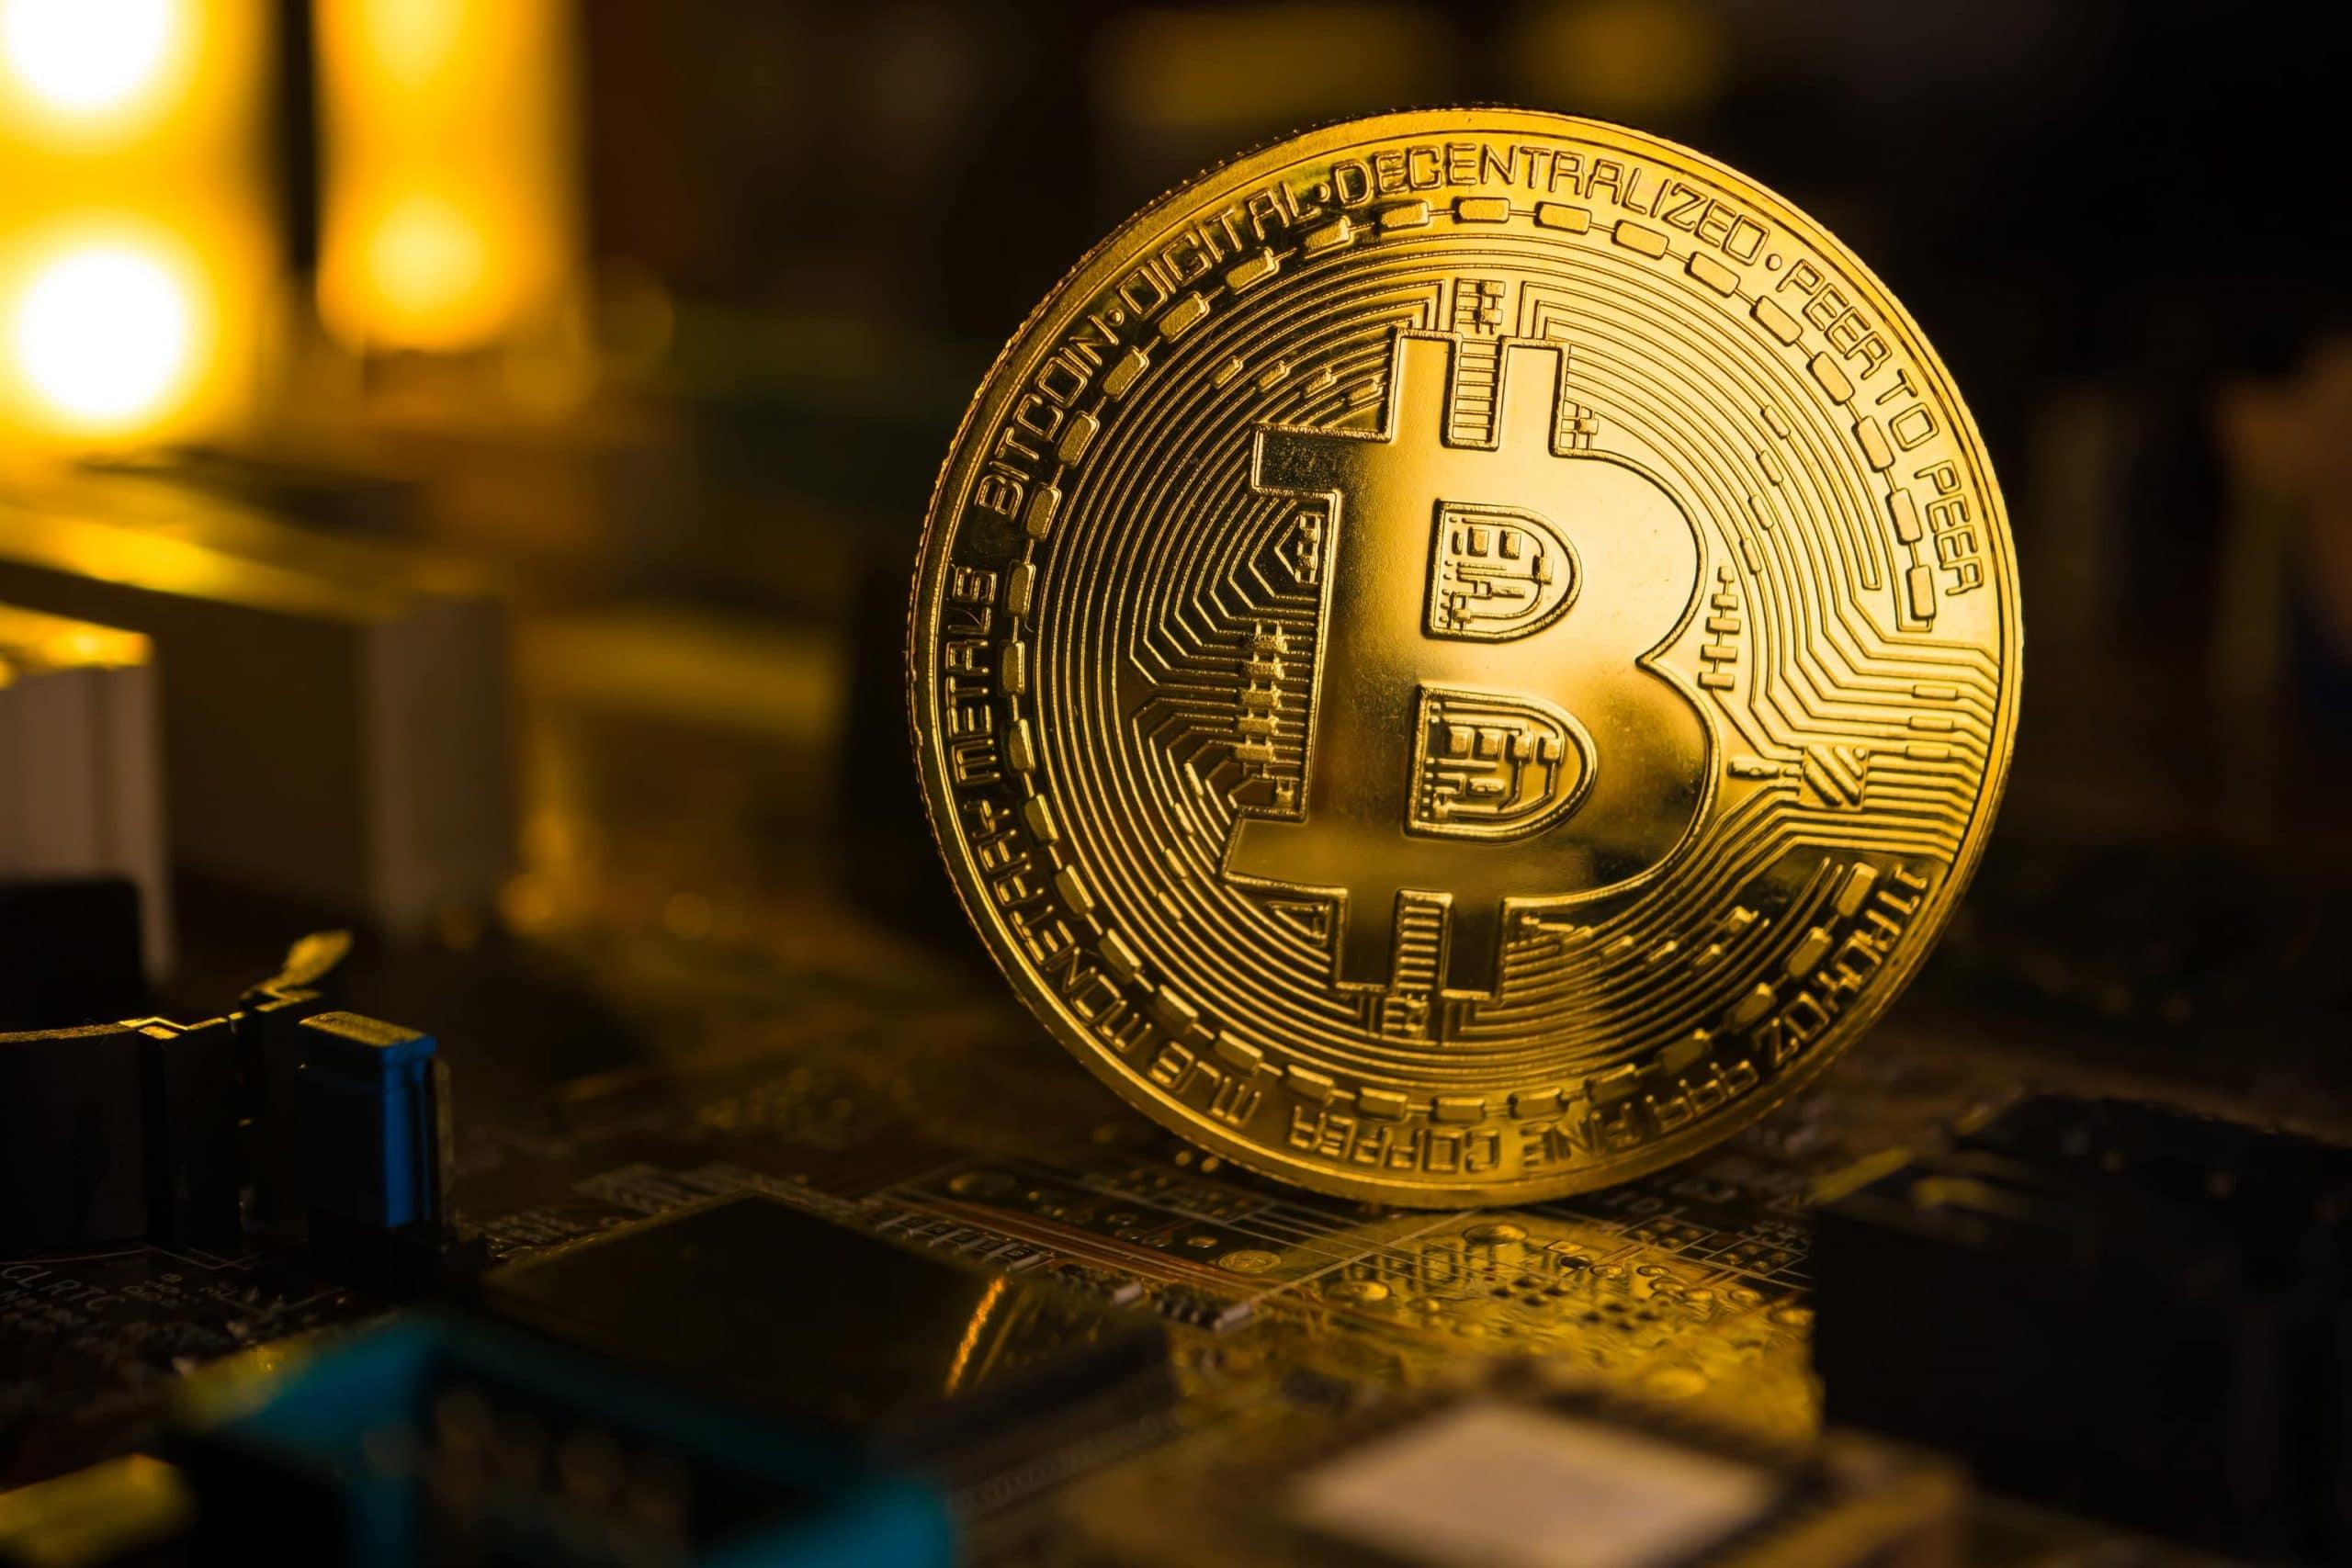 Bitcoin-Münze